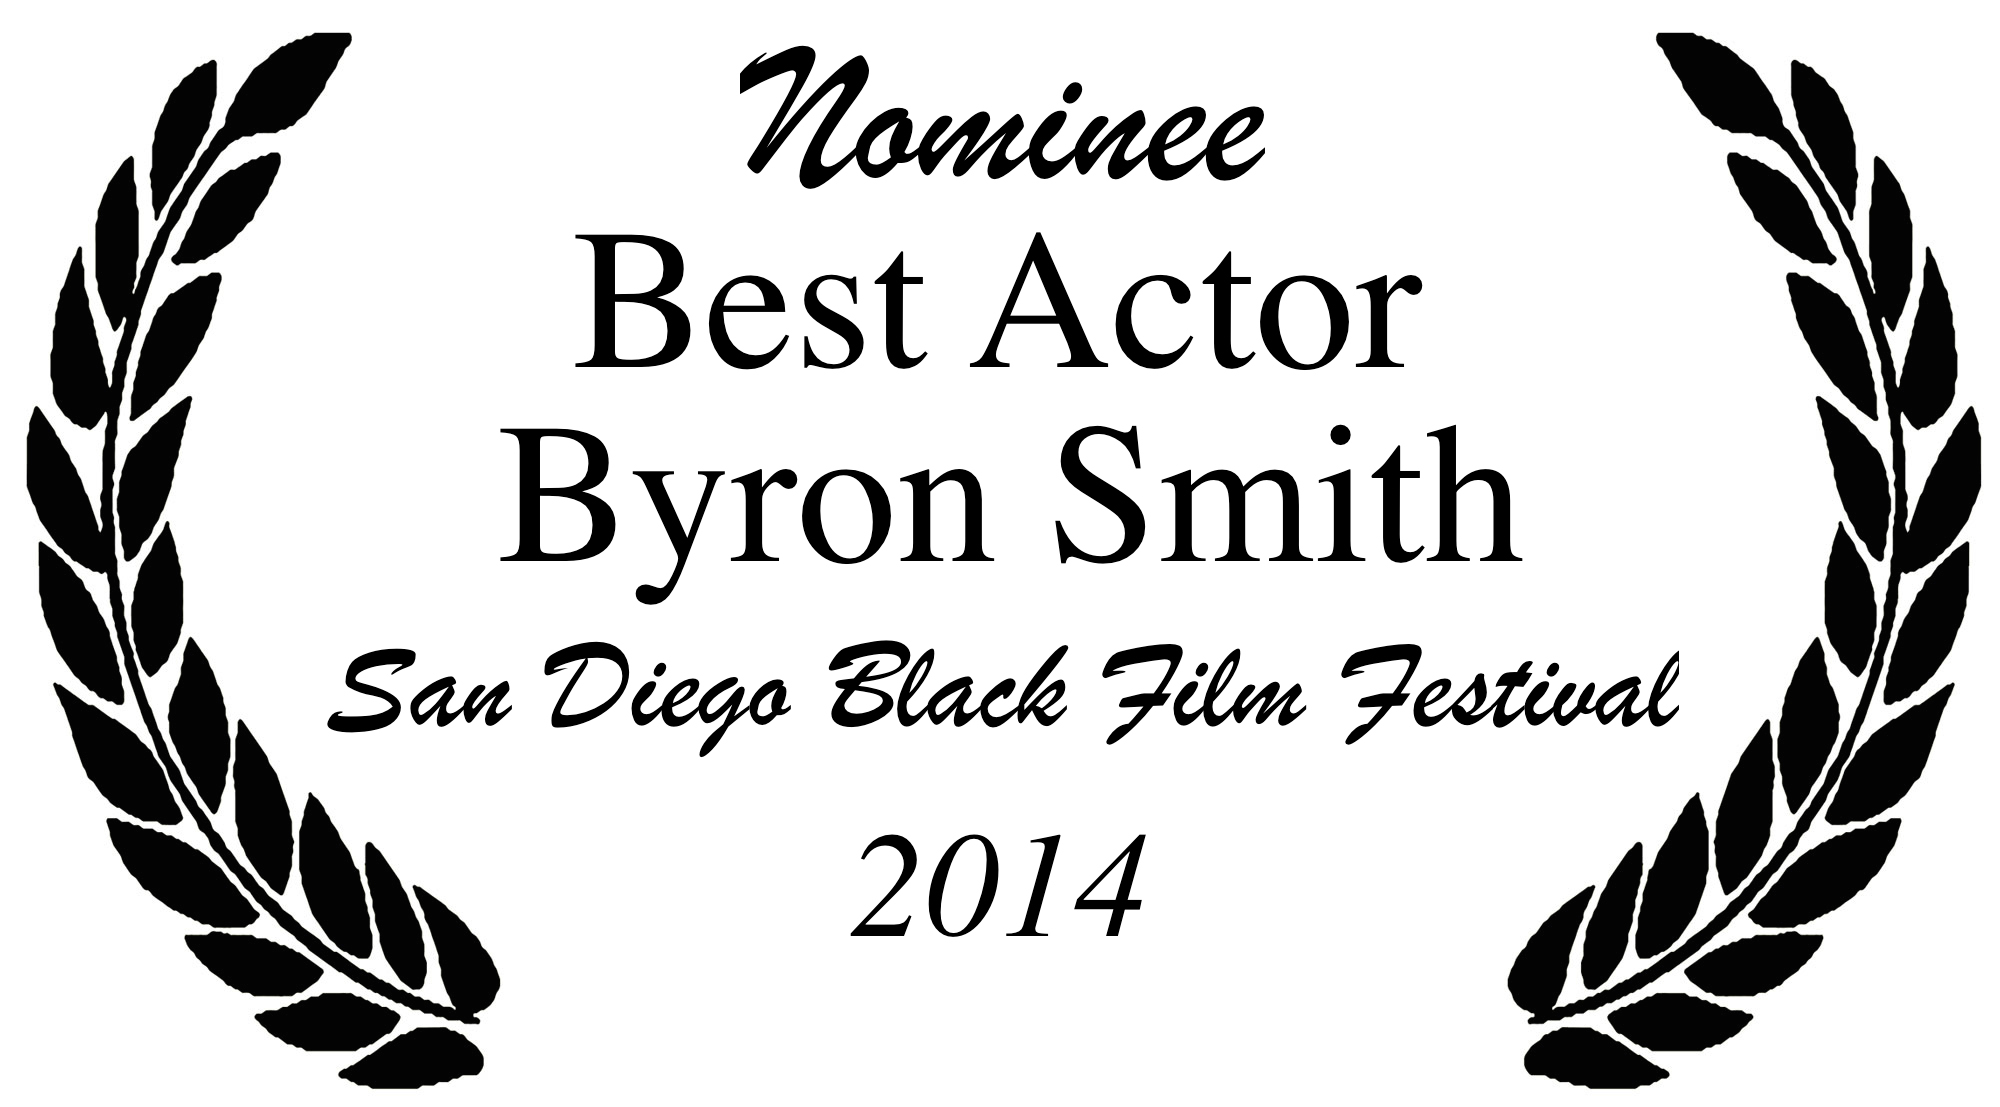 SDBFF Nominee.1.jpeg